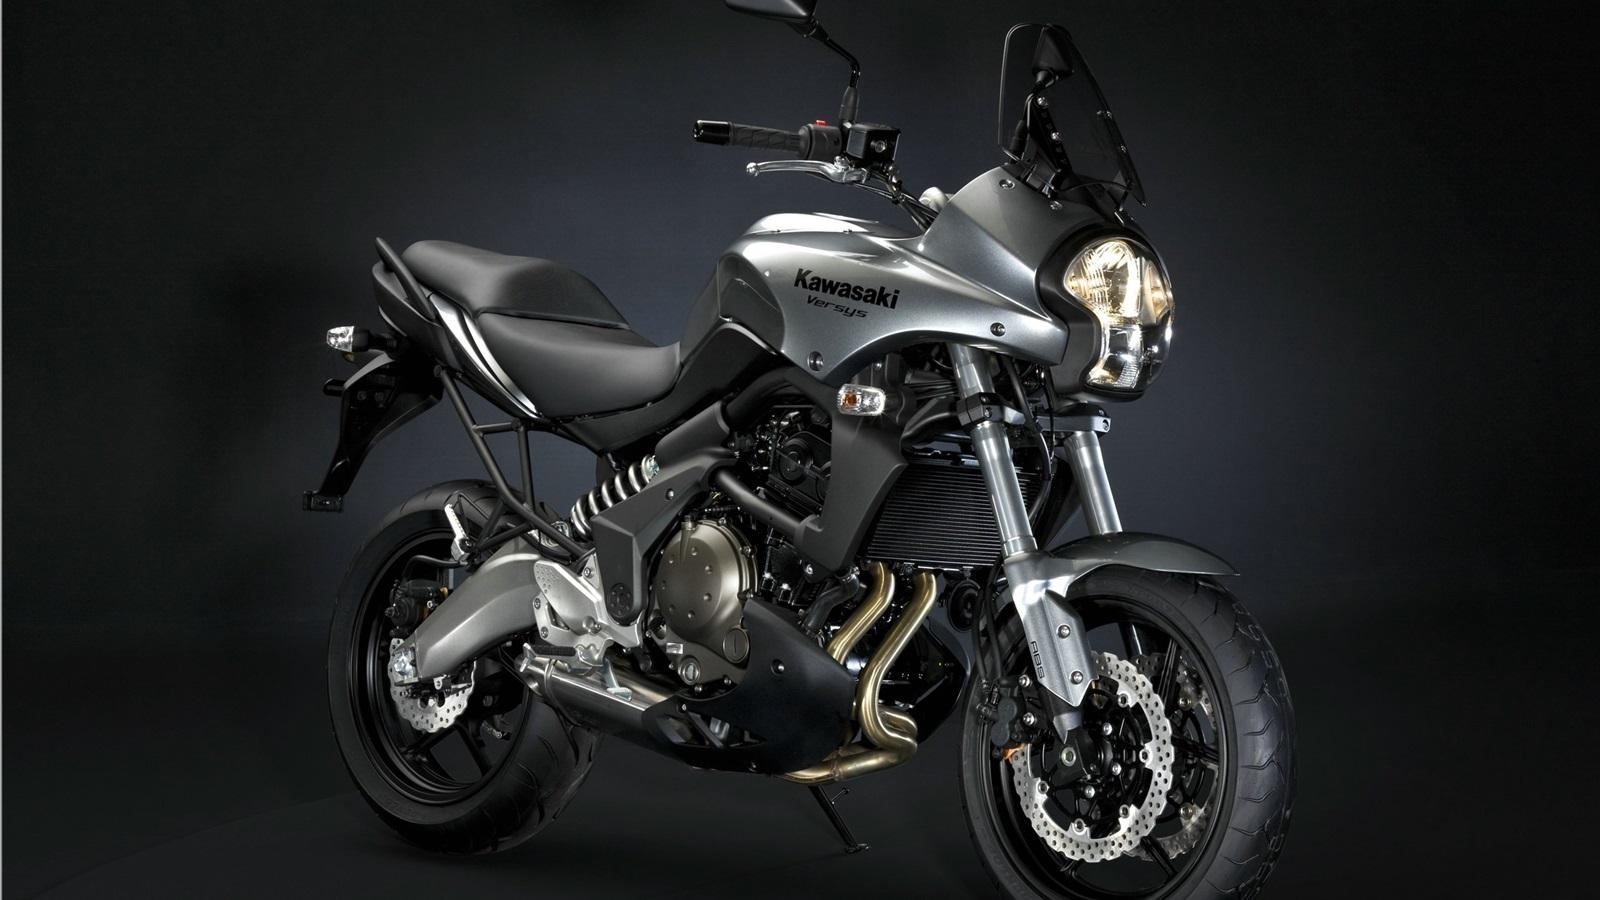 Motos Pisteras Ninja Hd 1280x1024: Kawasaki Moto Fonds D'écran